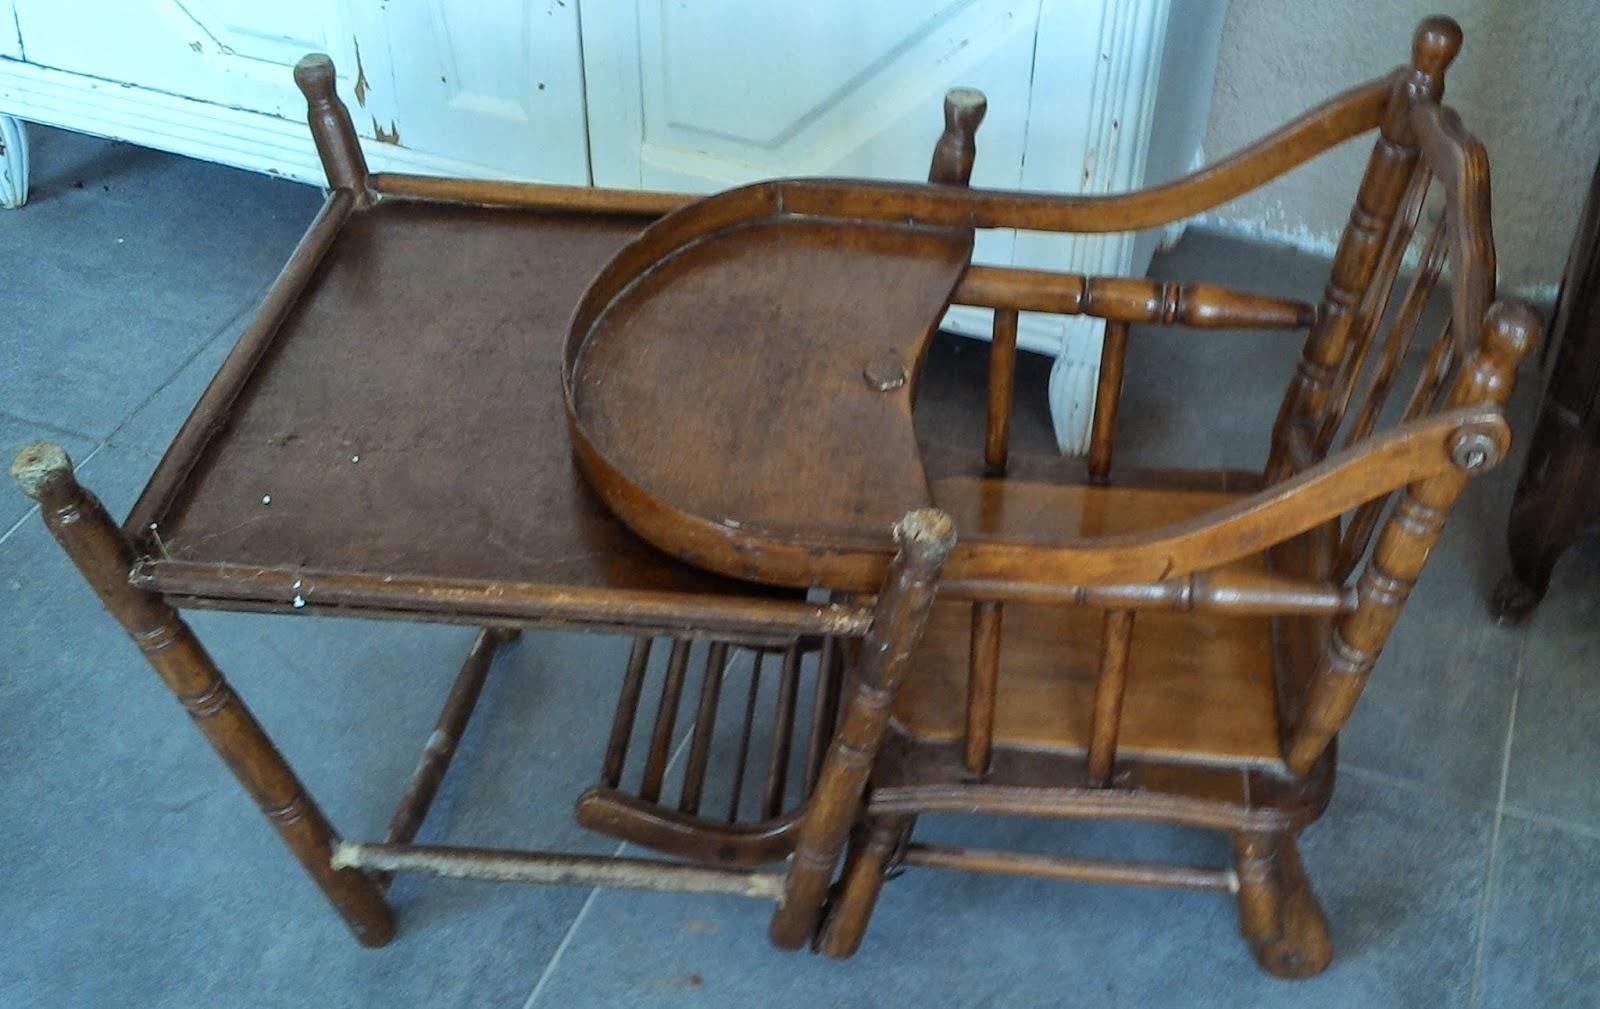 chaise haute enfant fa on bambou thonet ancienne a systeme pliante. Black Bedroom Furniture Sets. Home Design Ideas